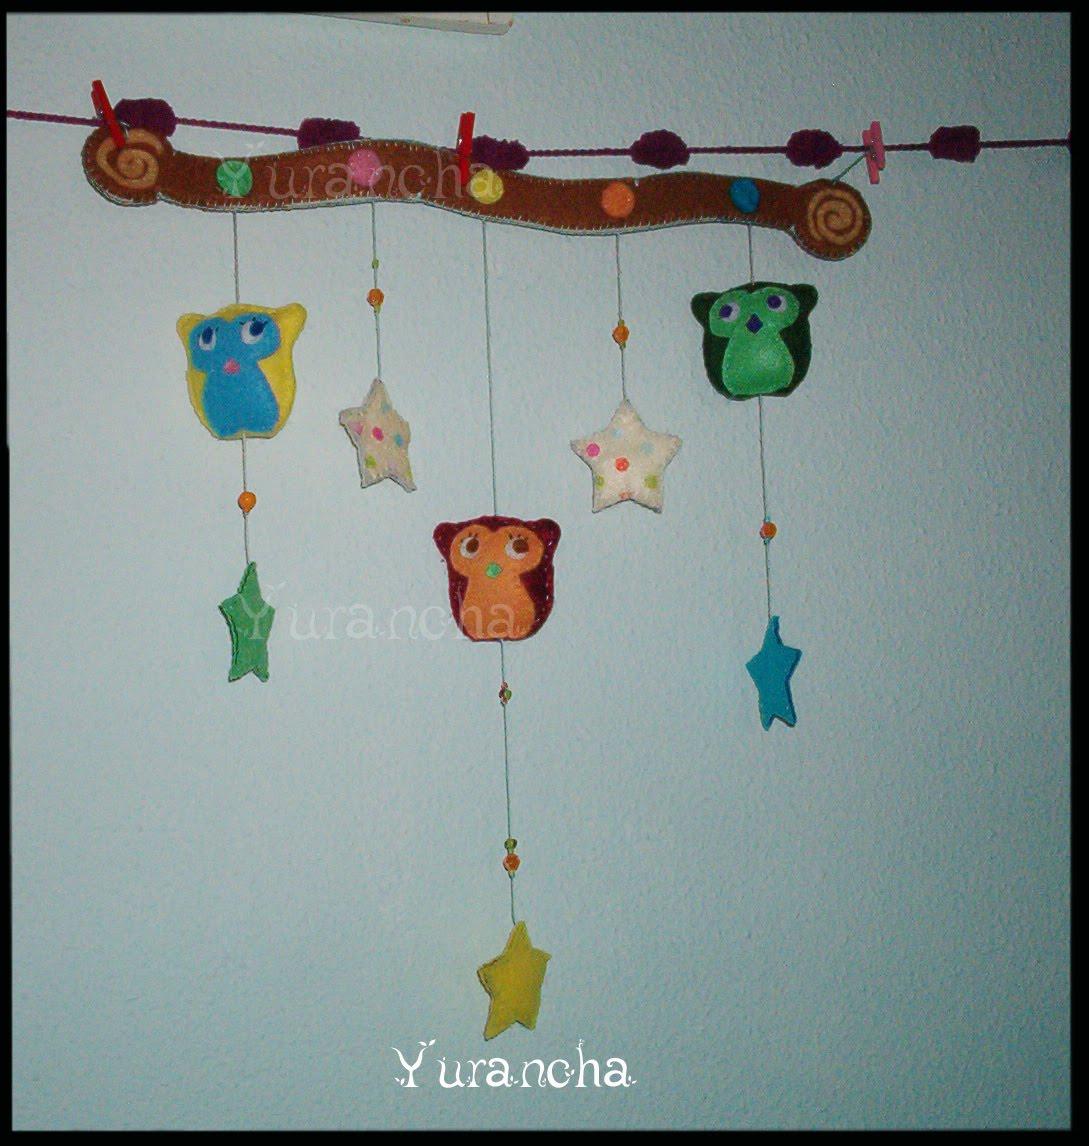 Yurancha: Movil de fieltro de buhitos de la suerte